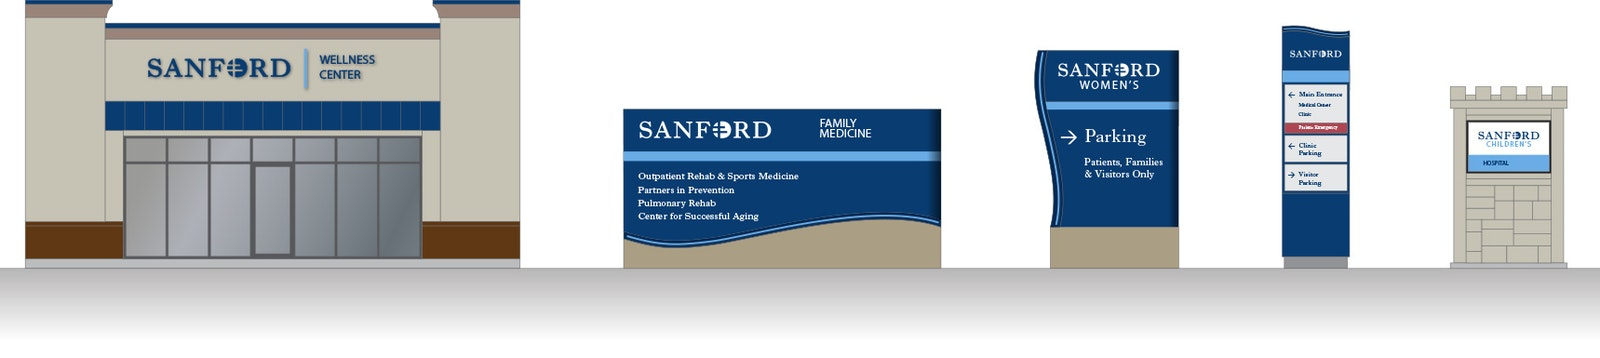 Sandford signage